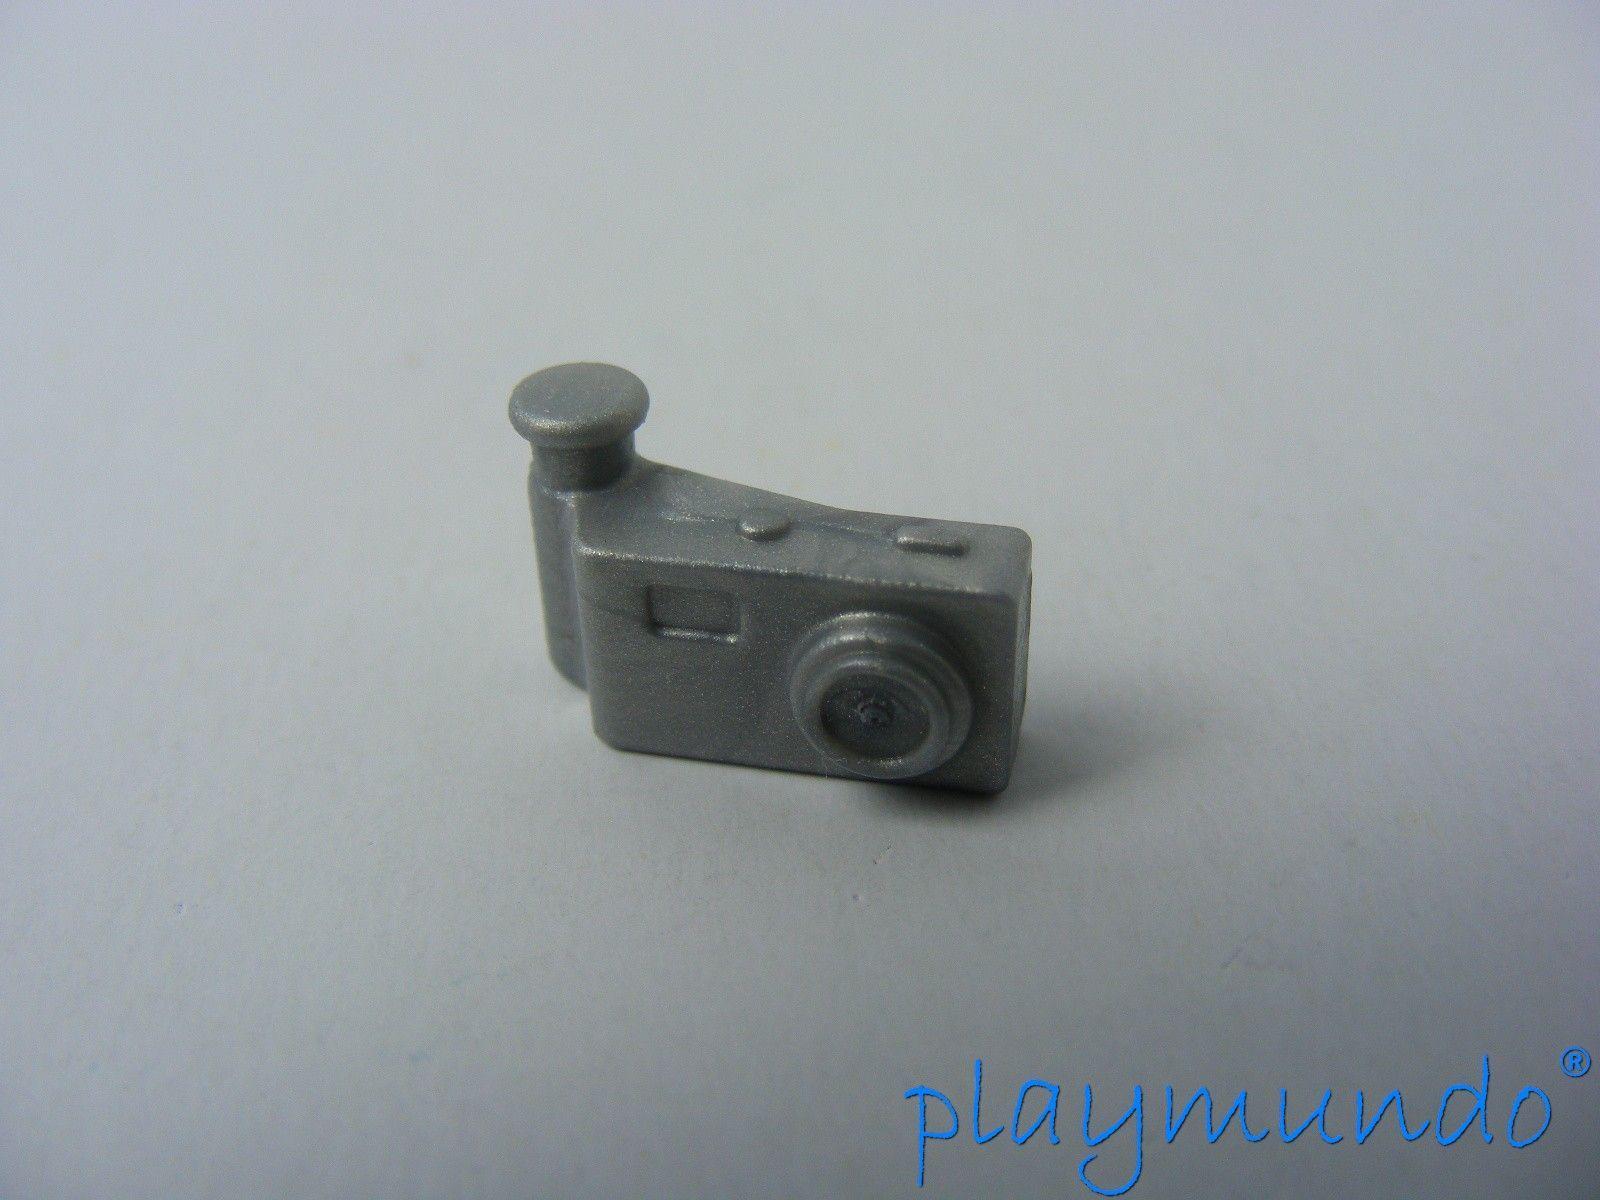 PLAYMOBIL CAMARA DIGITAL PY7722